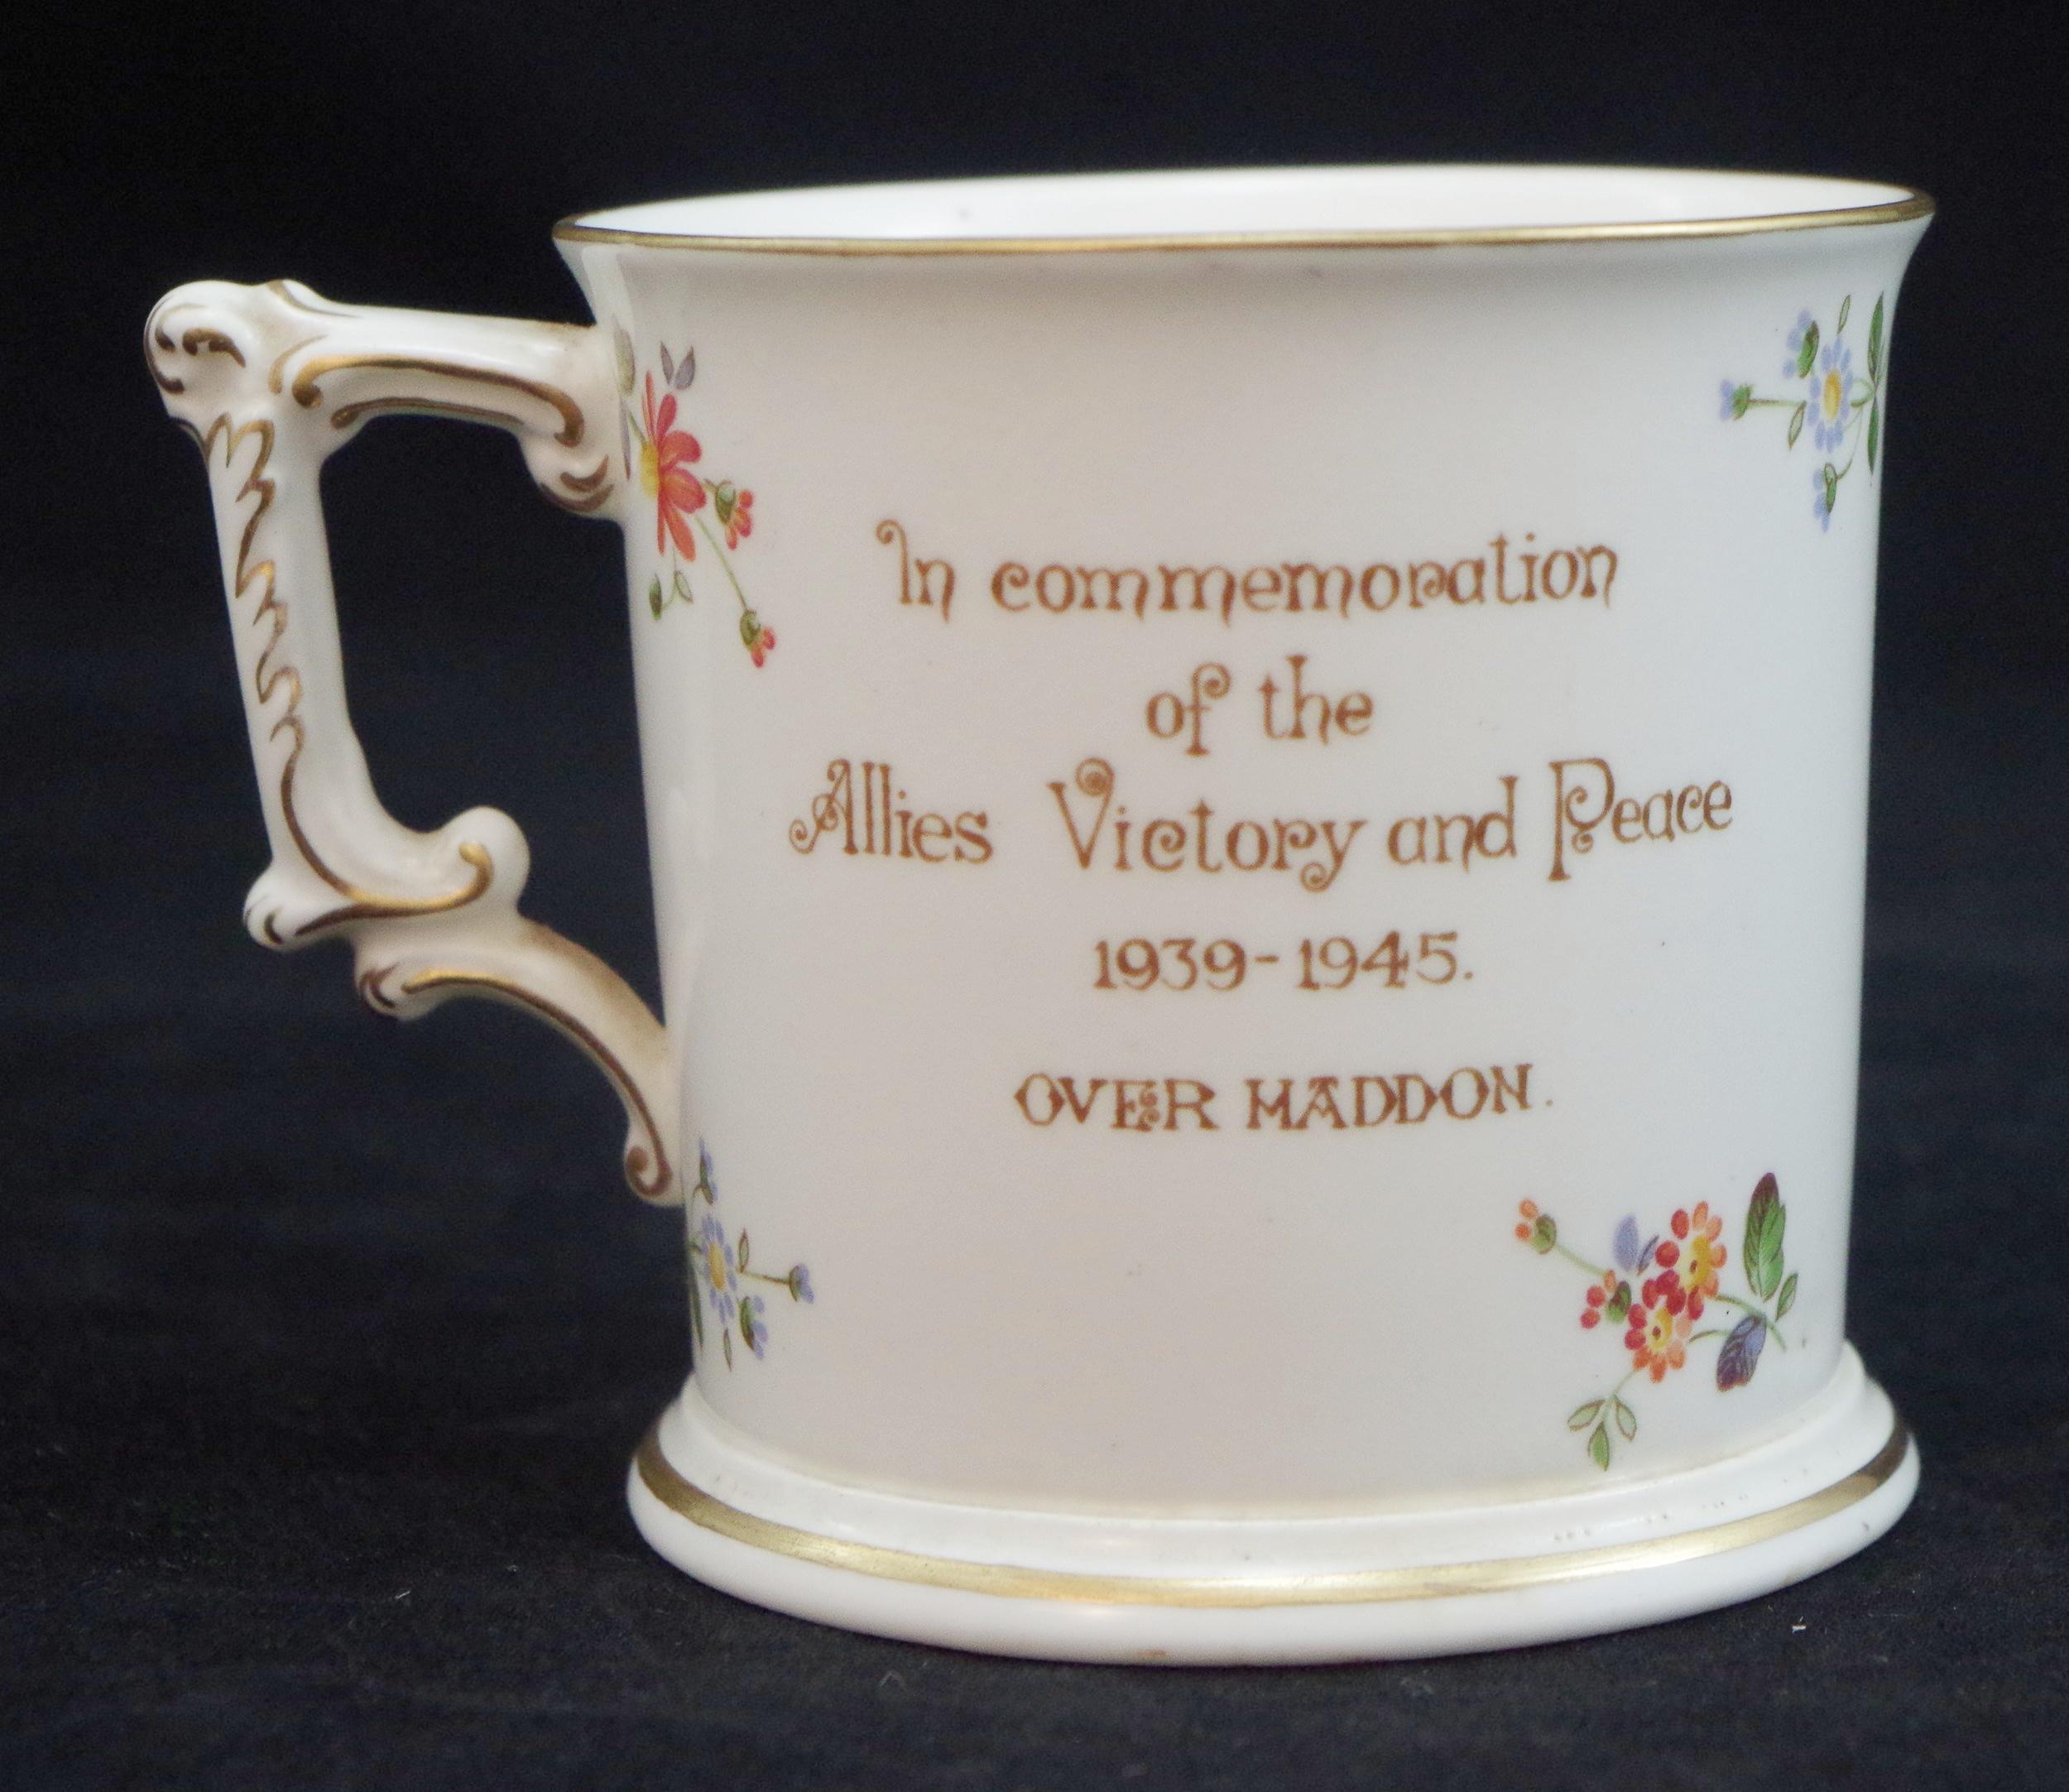 royal-crown-derby-mug-derby-posie-A228-over-haddon-reverse